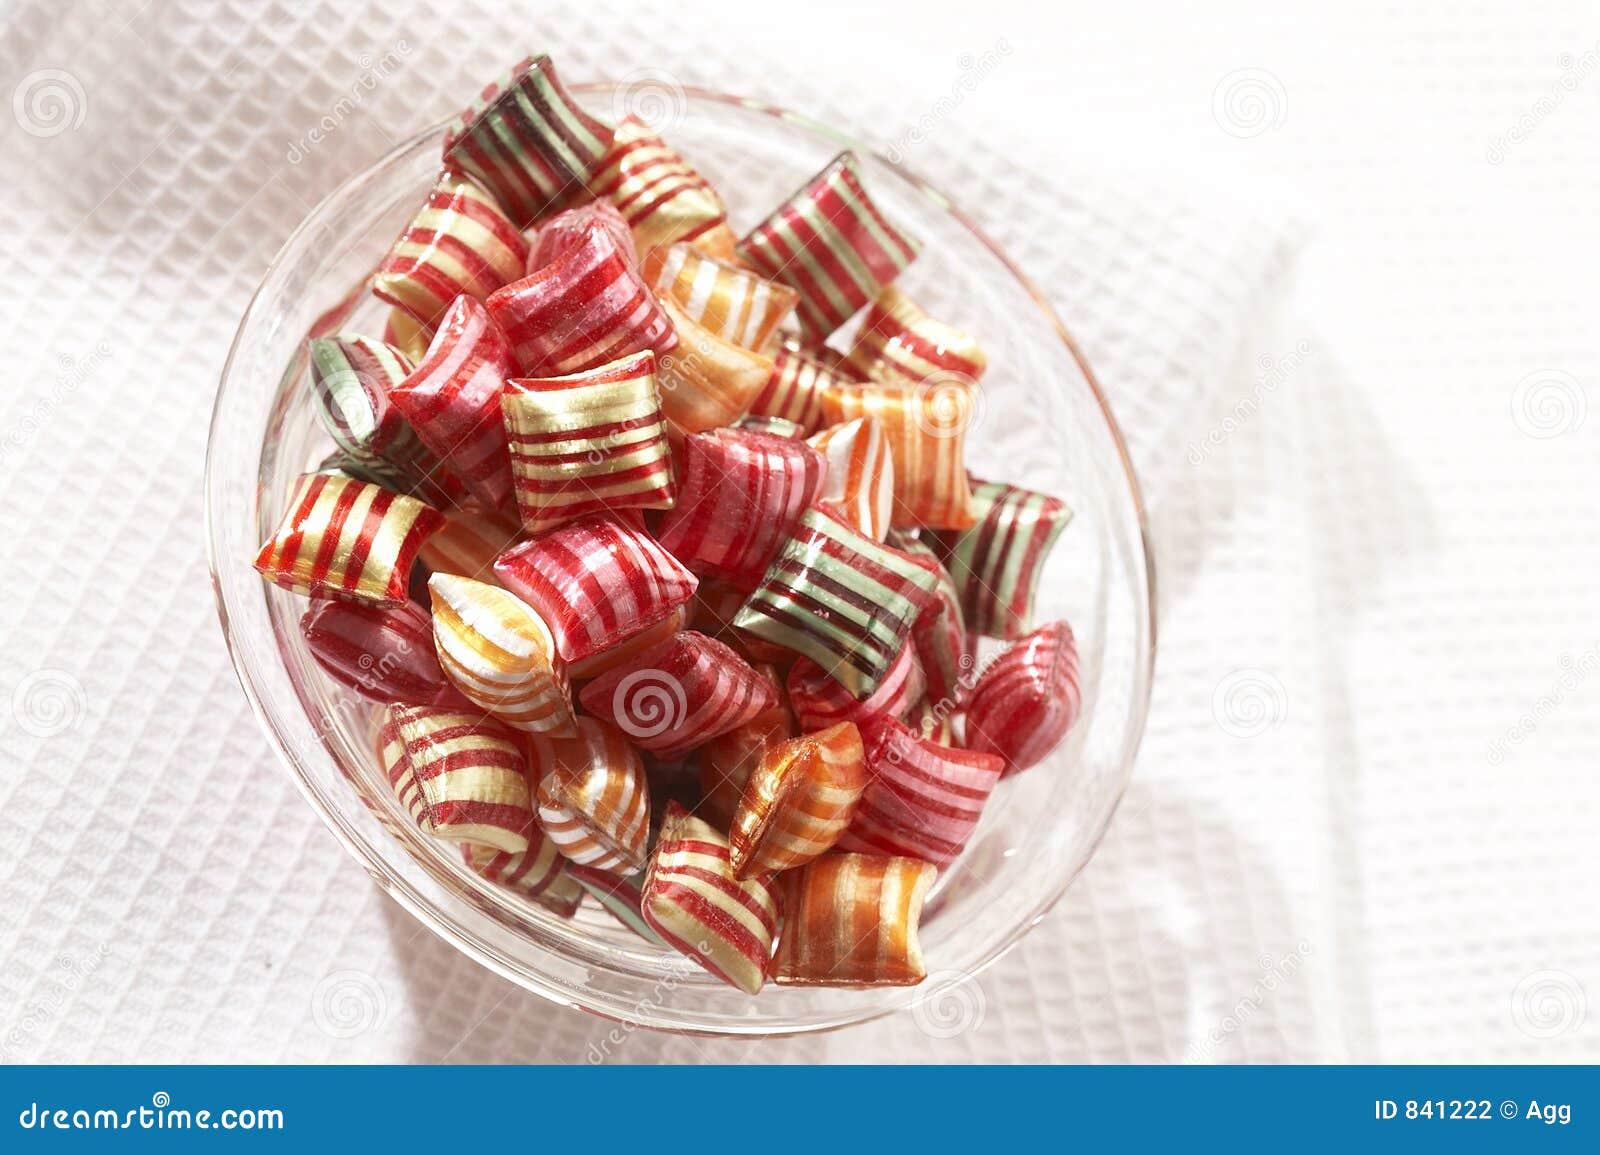 Stripy lollipop